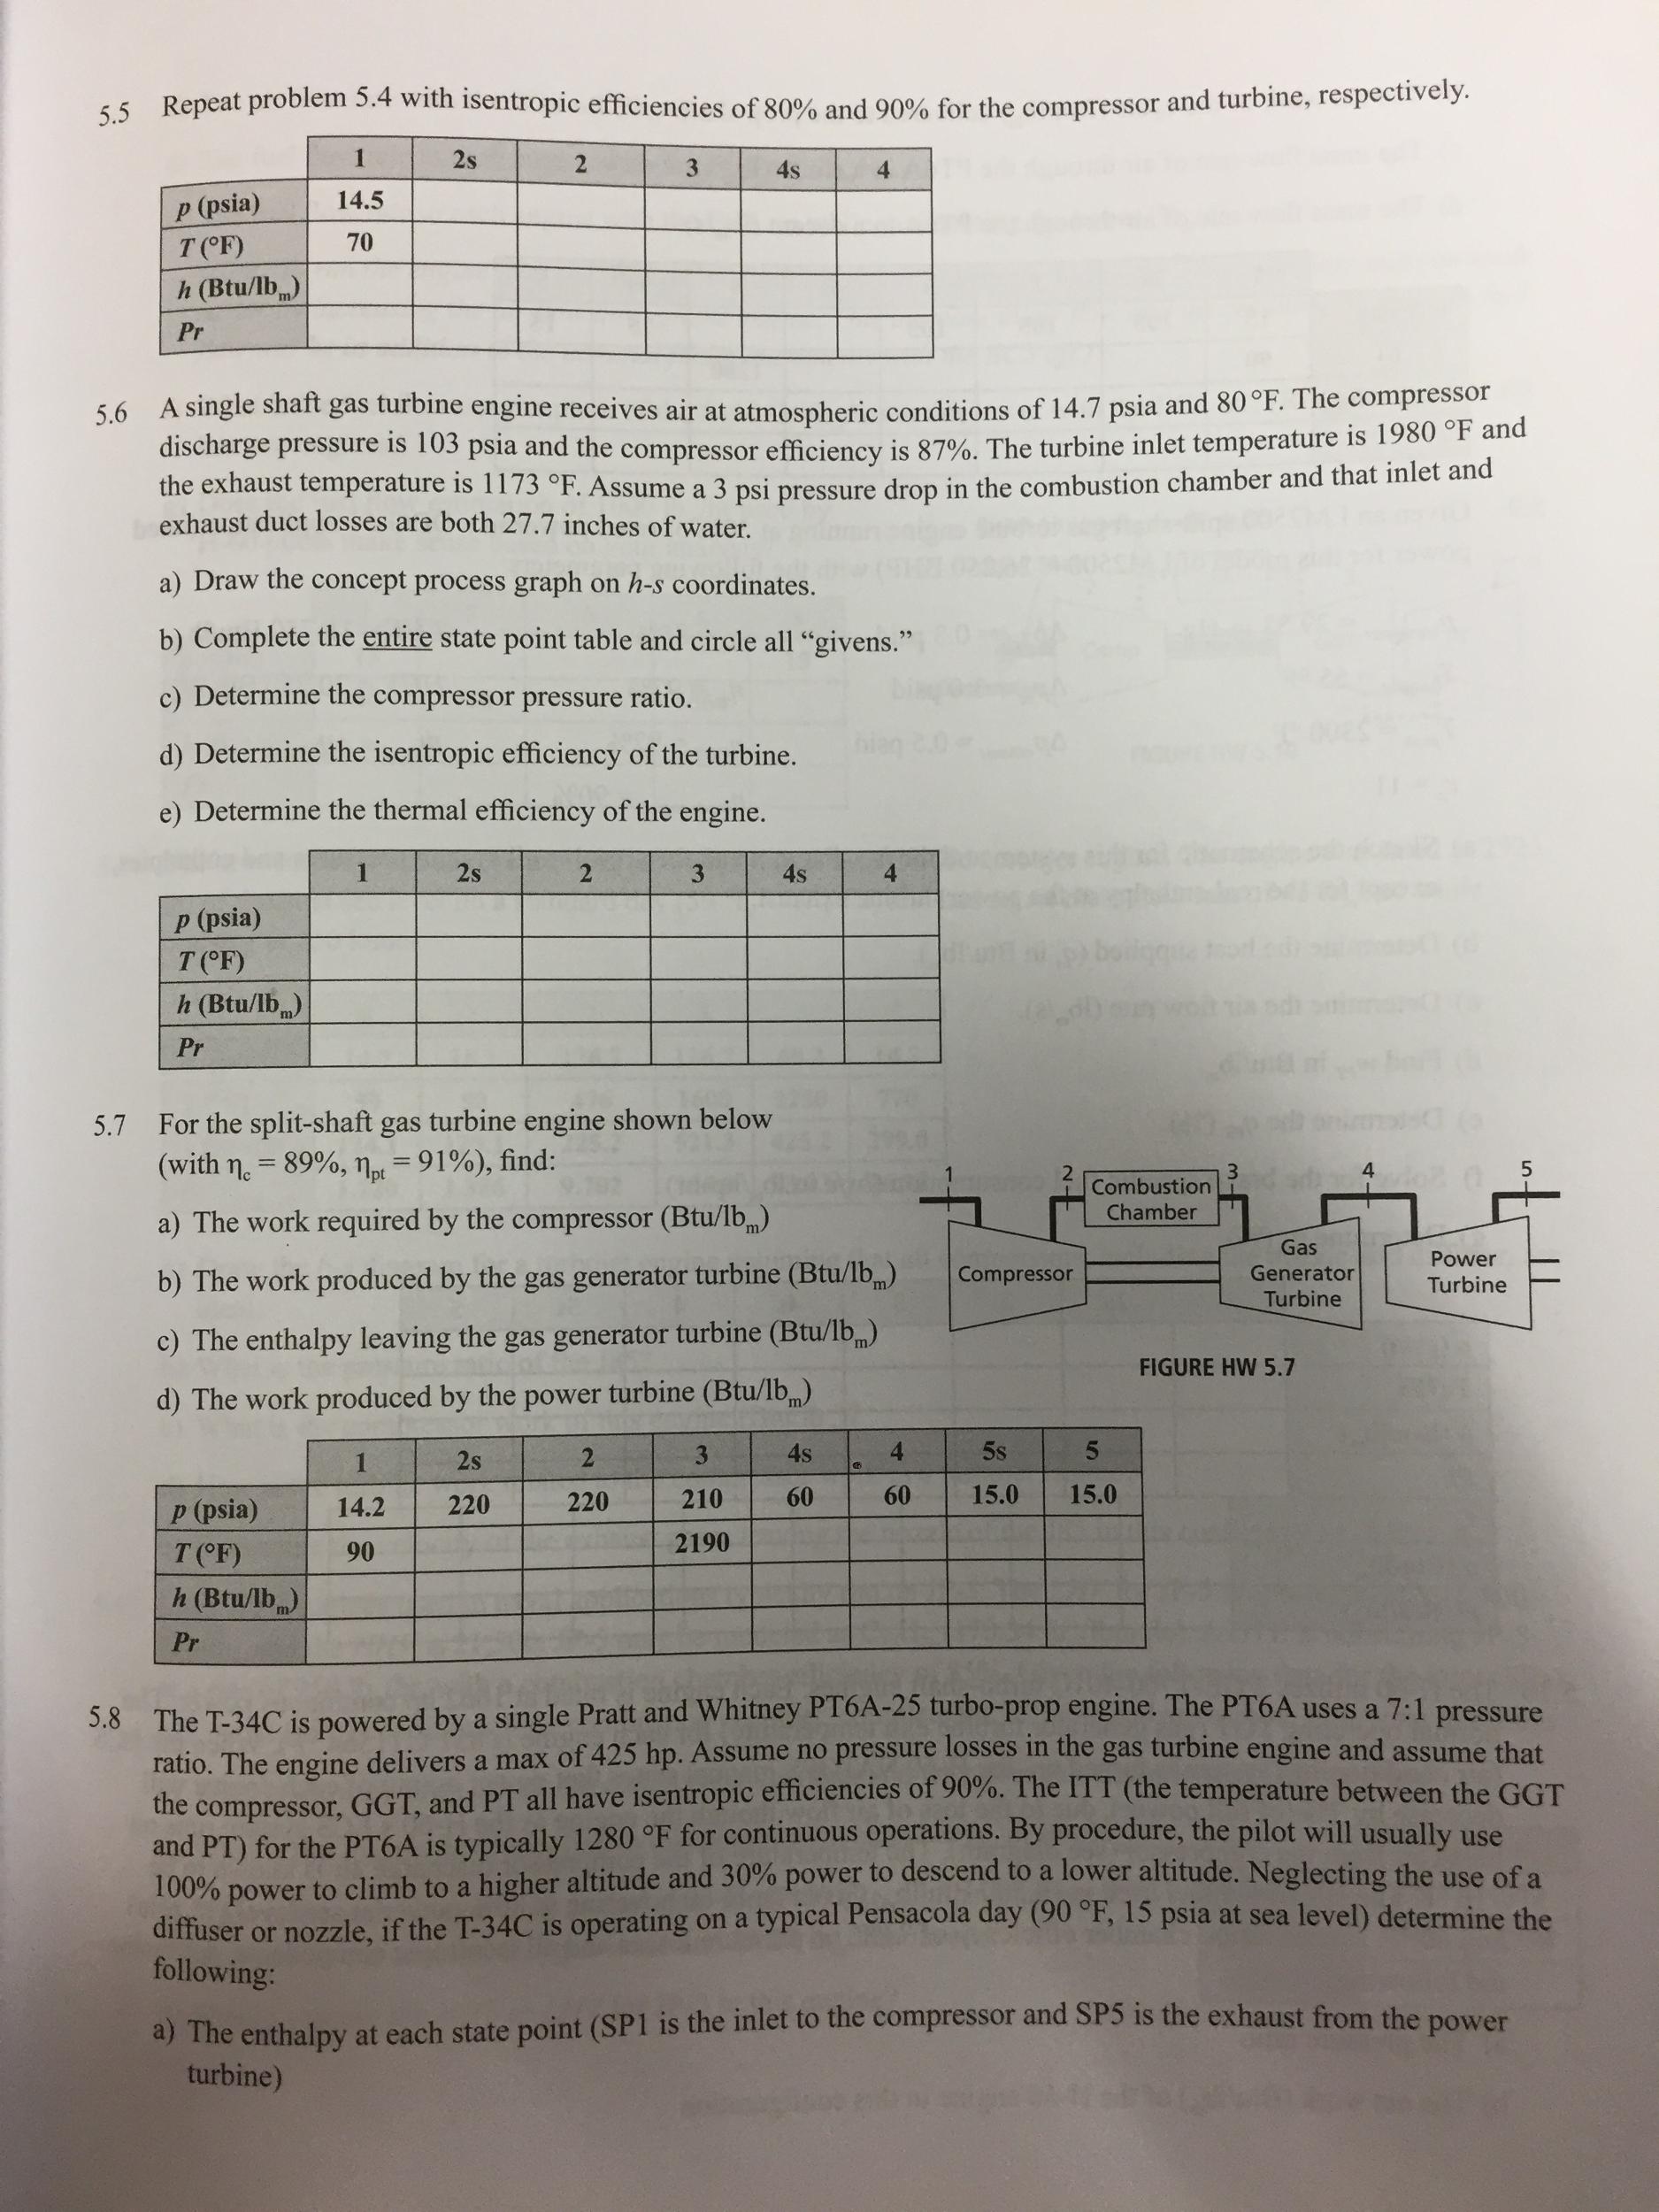 Repeat Problem 5 4 With Isentropic Efficiencies